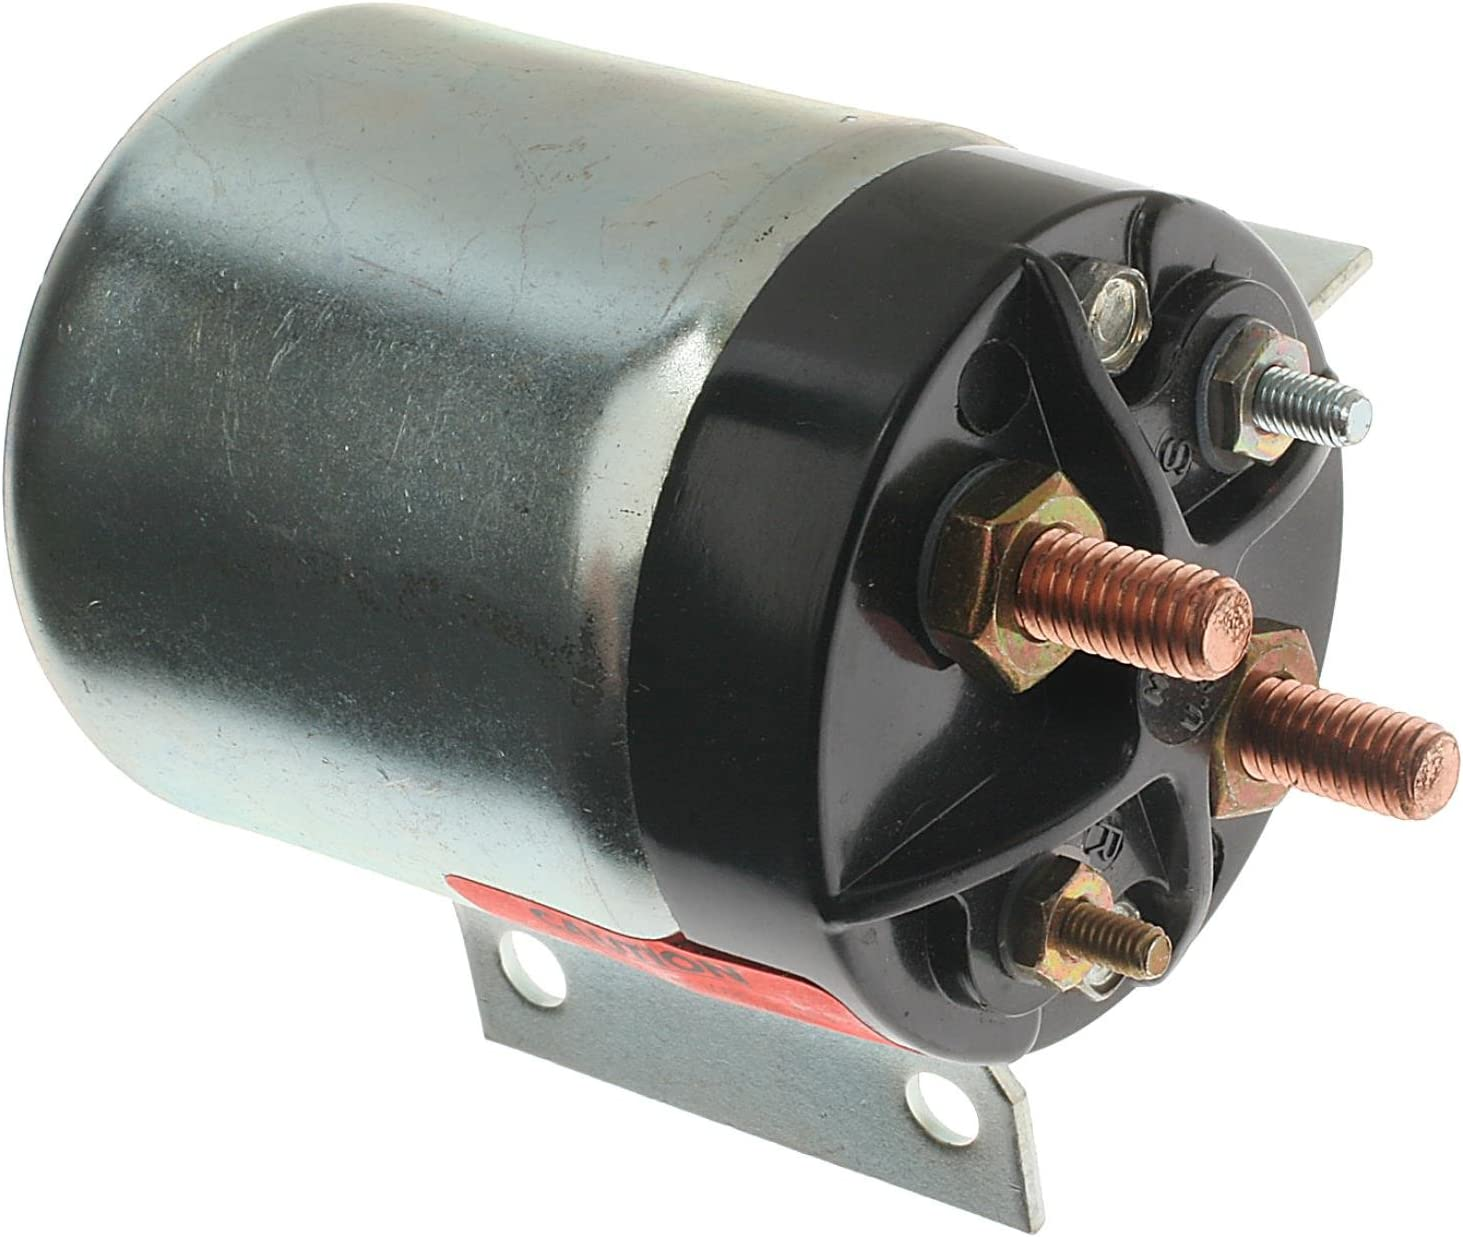 ACDelco U951 Professional Starter Solenoid